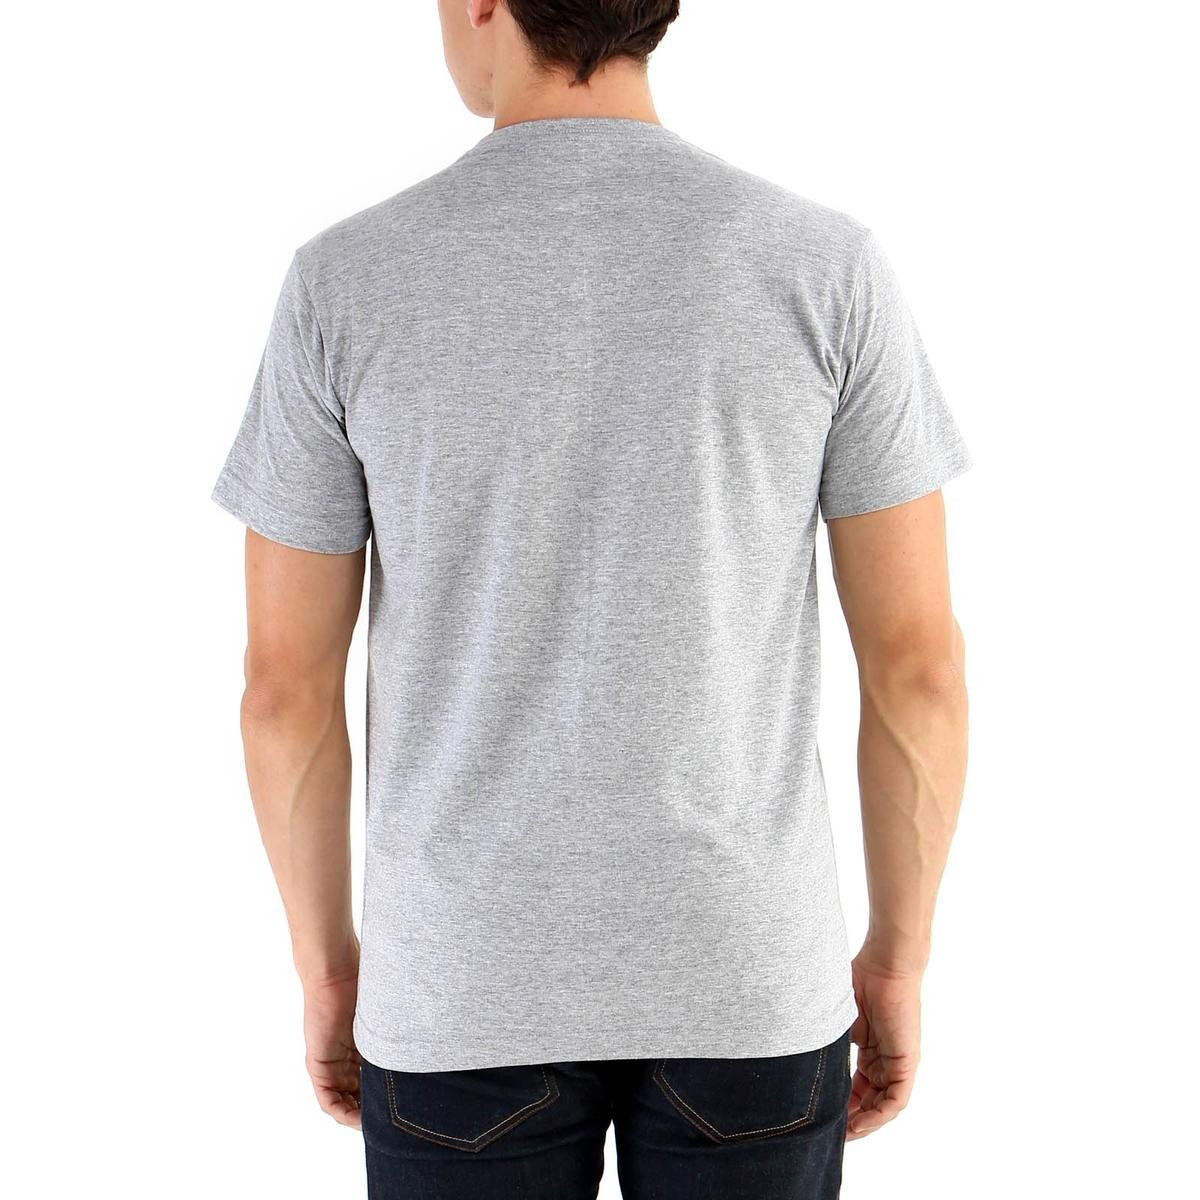 Camiseta Ouroboros manga curta Bagunça - Cinza